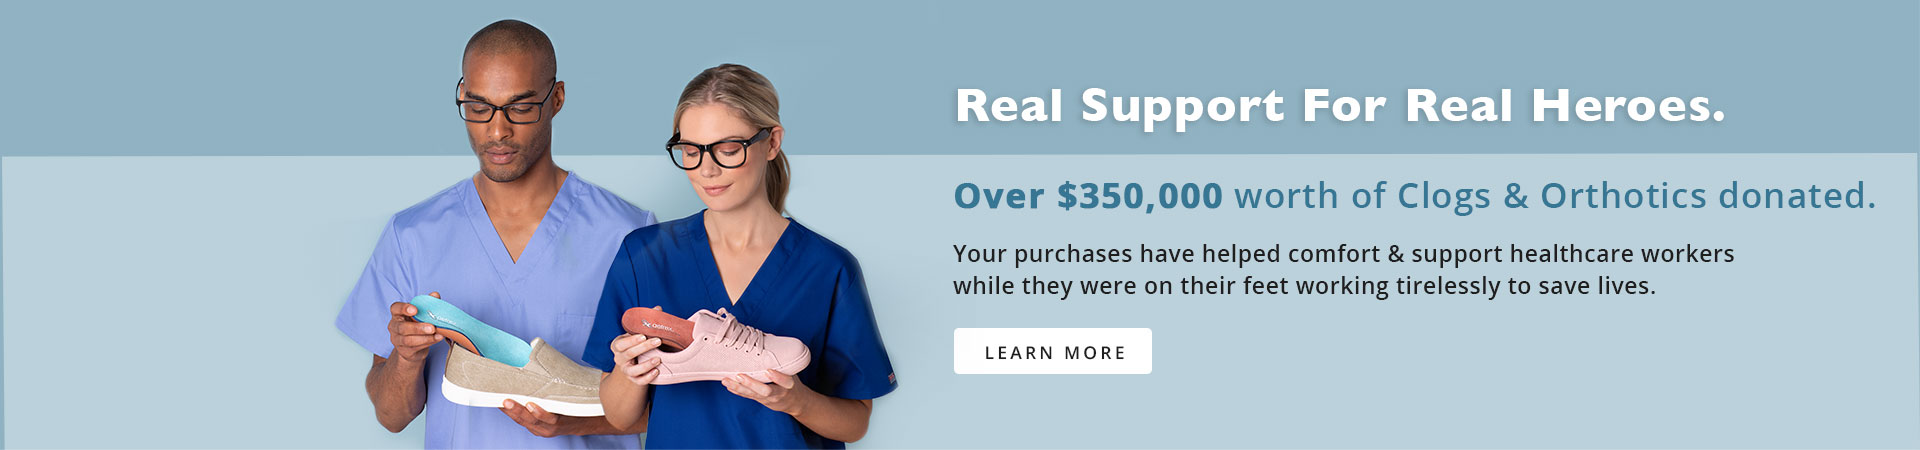 Professional Healthcare Donation